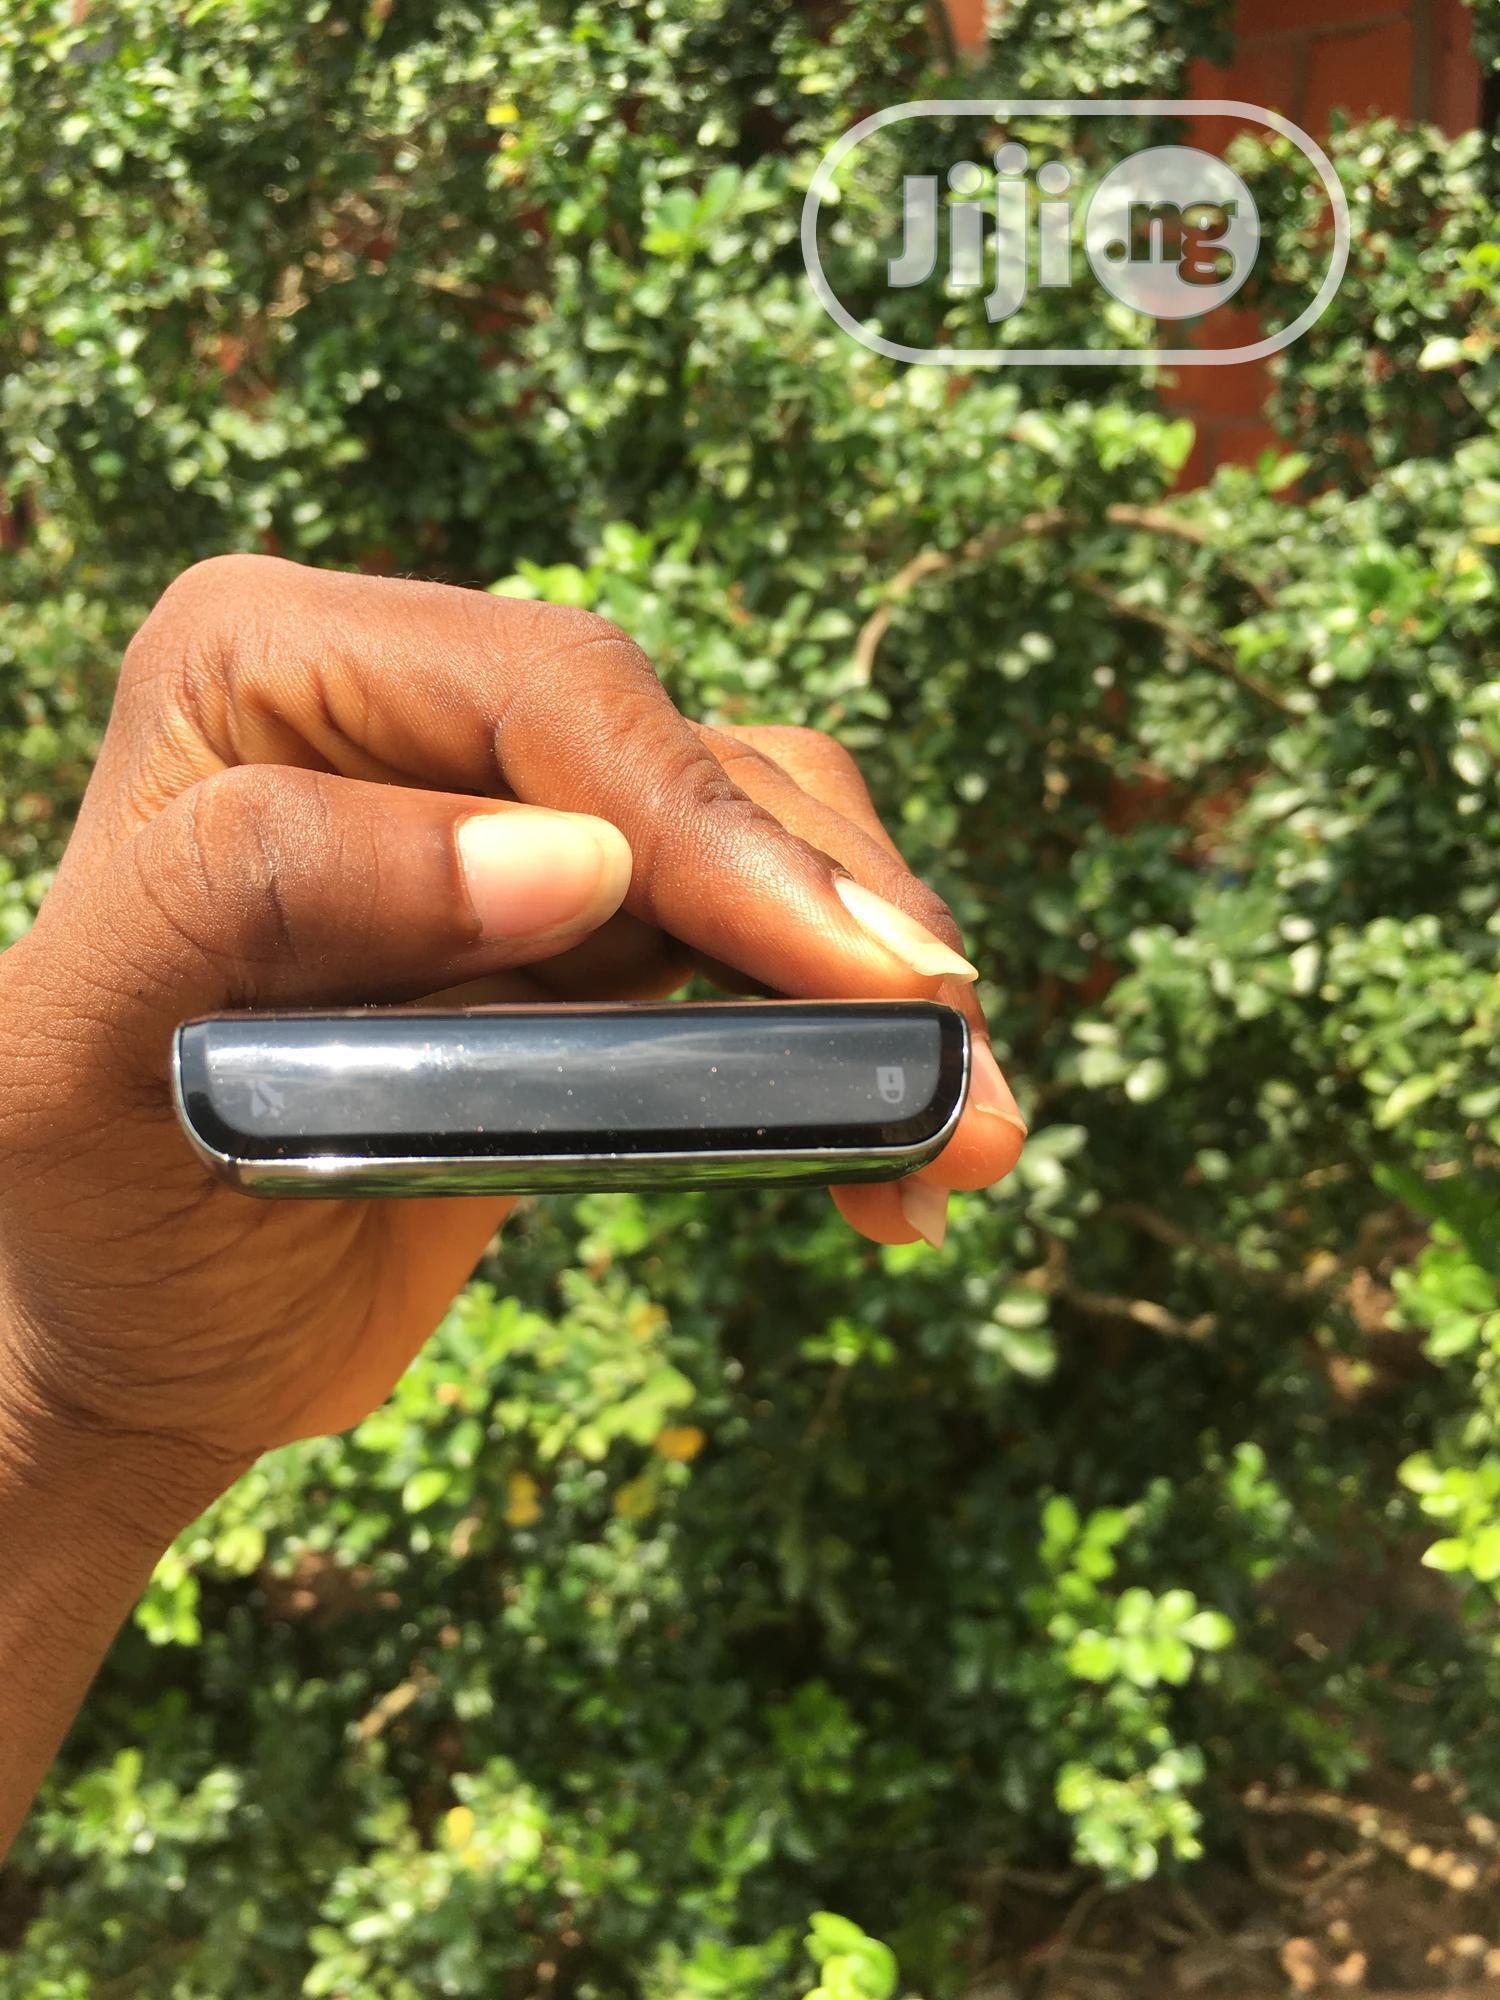 BlackBerry Bold 9700 Black | Mobile Phones for sale in Surulere, Lagos State, Nigeria